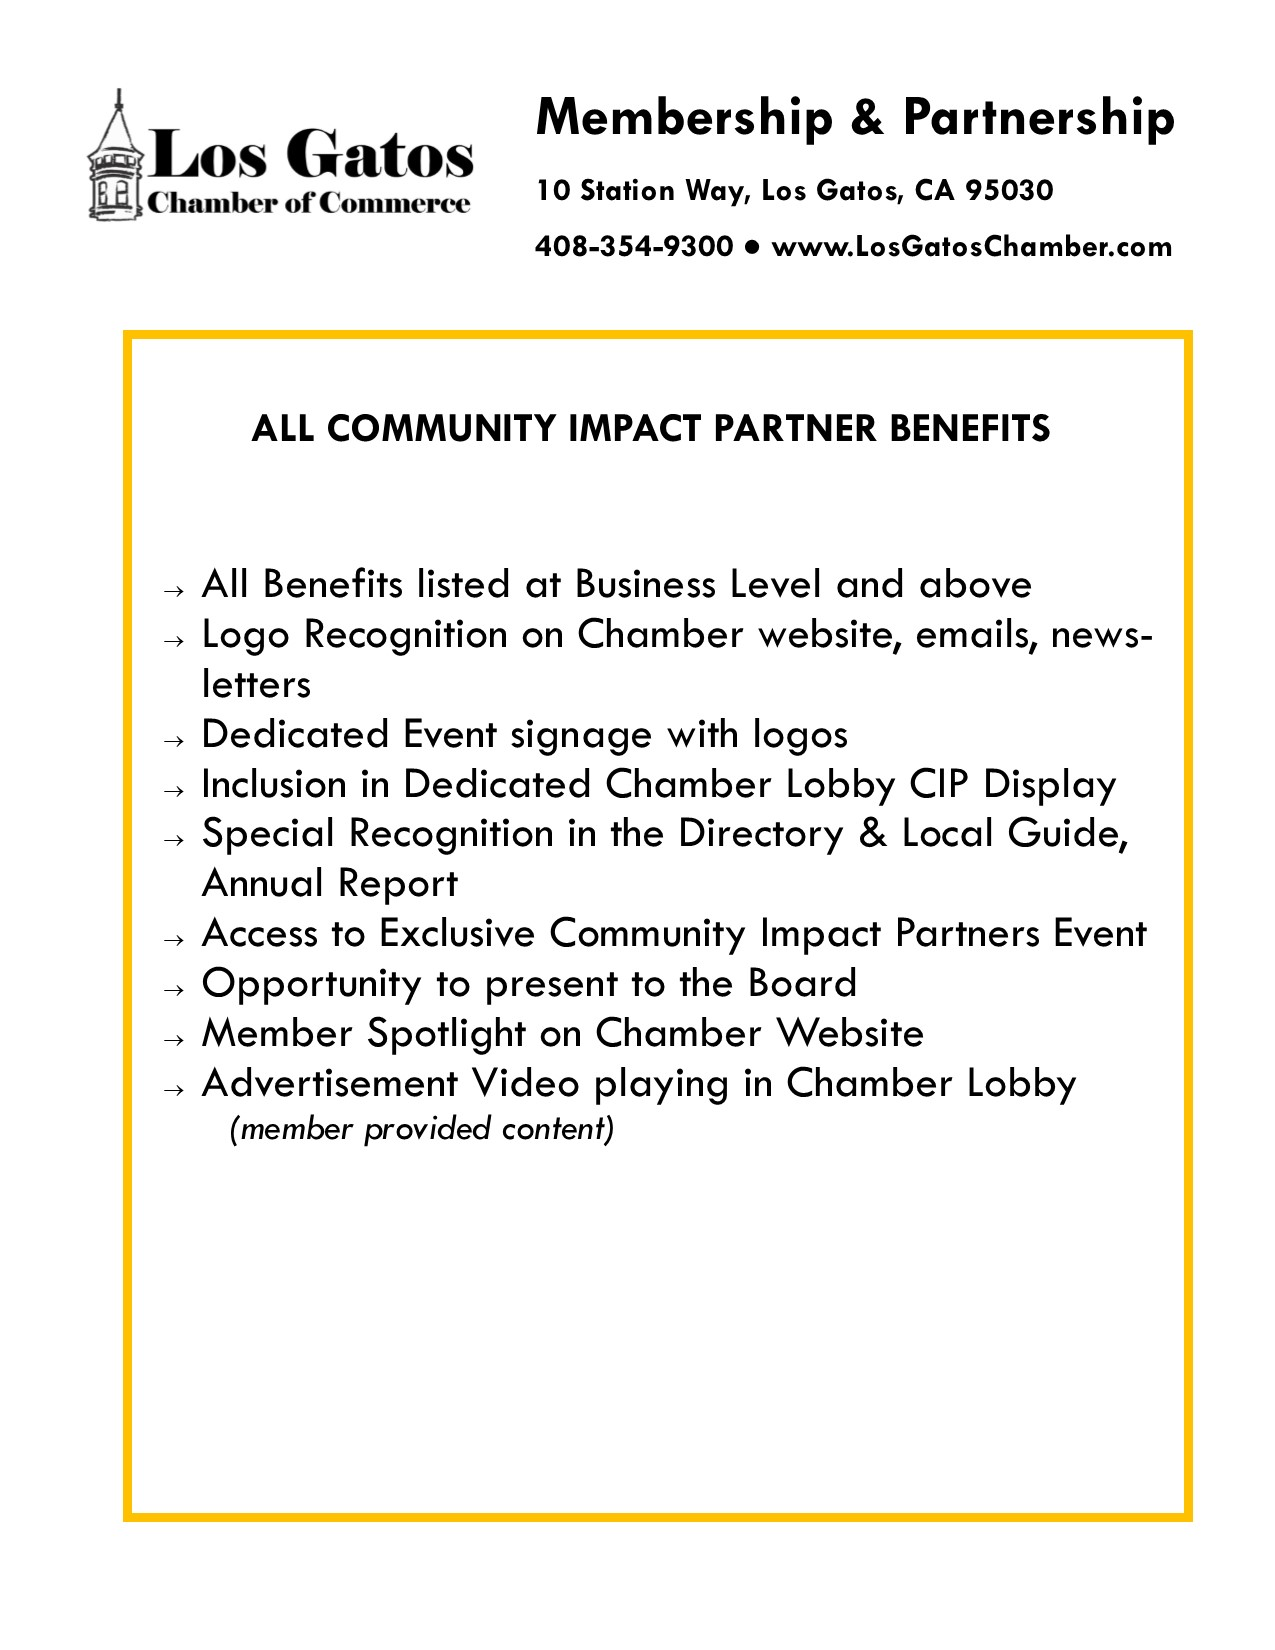 Membership-Levels-2018-all-CIP-benefits-w1275.jpg